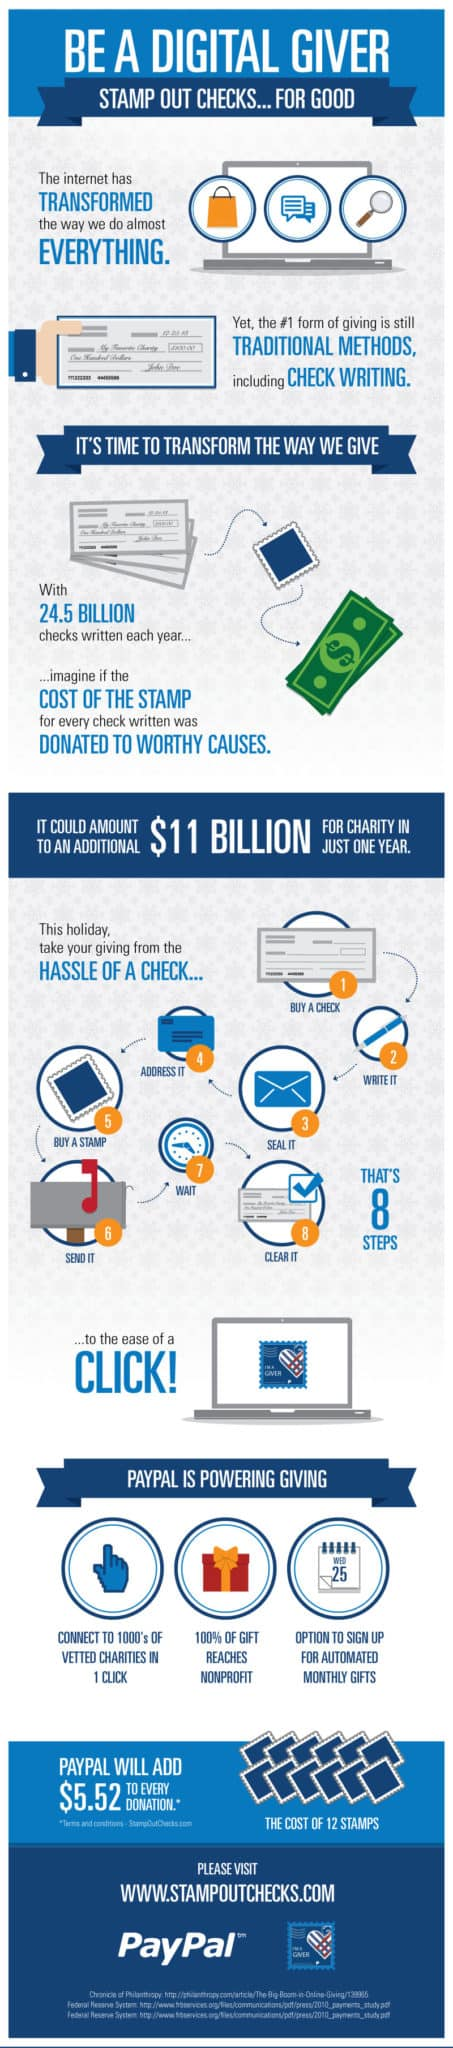 PayPal StampOutChecks Infographic